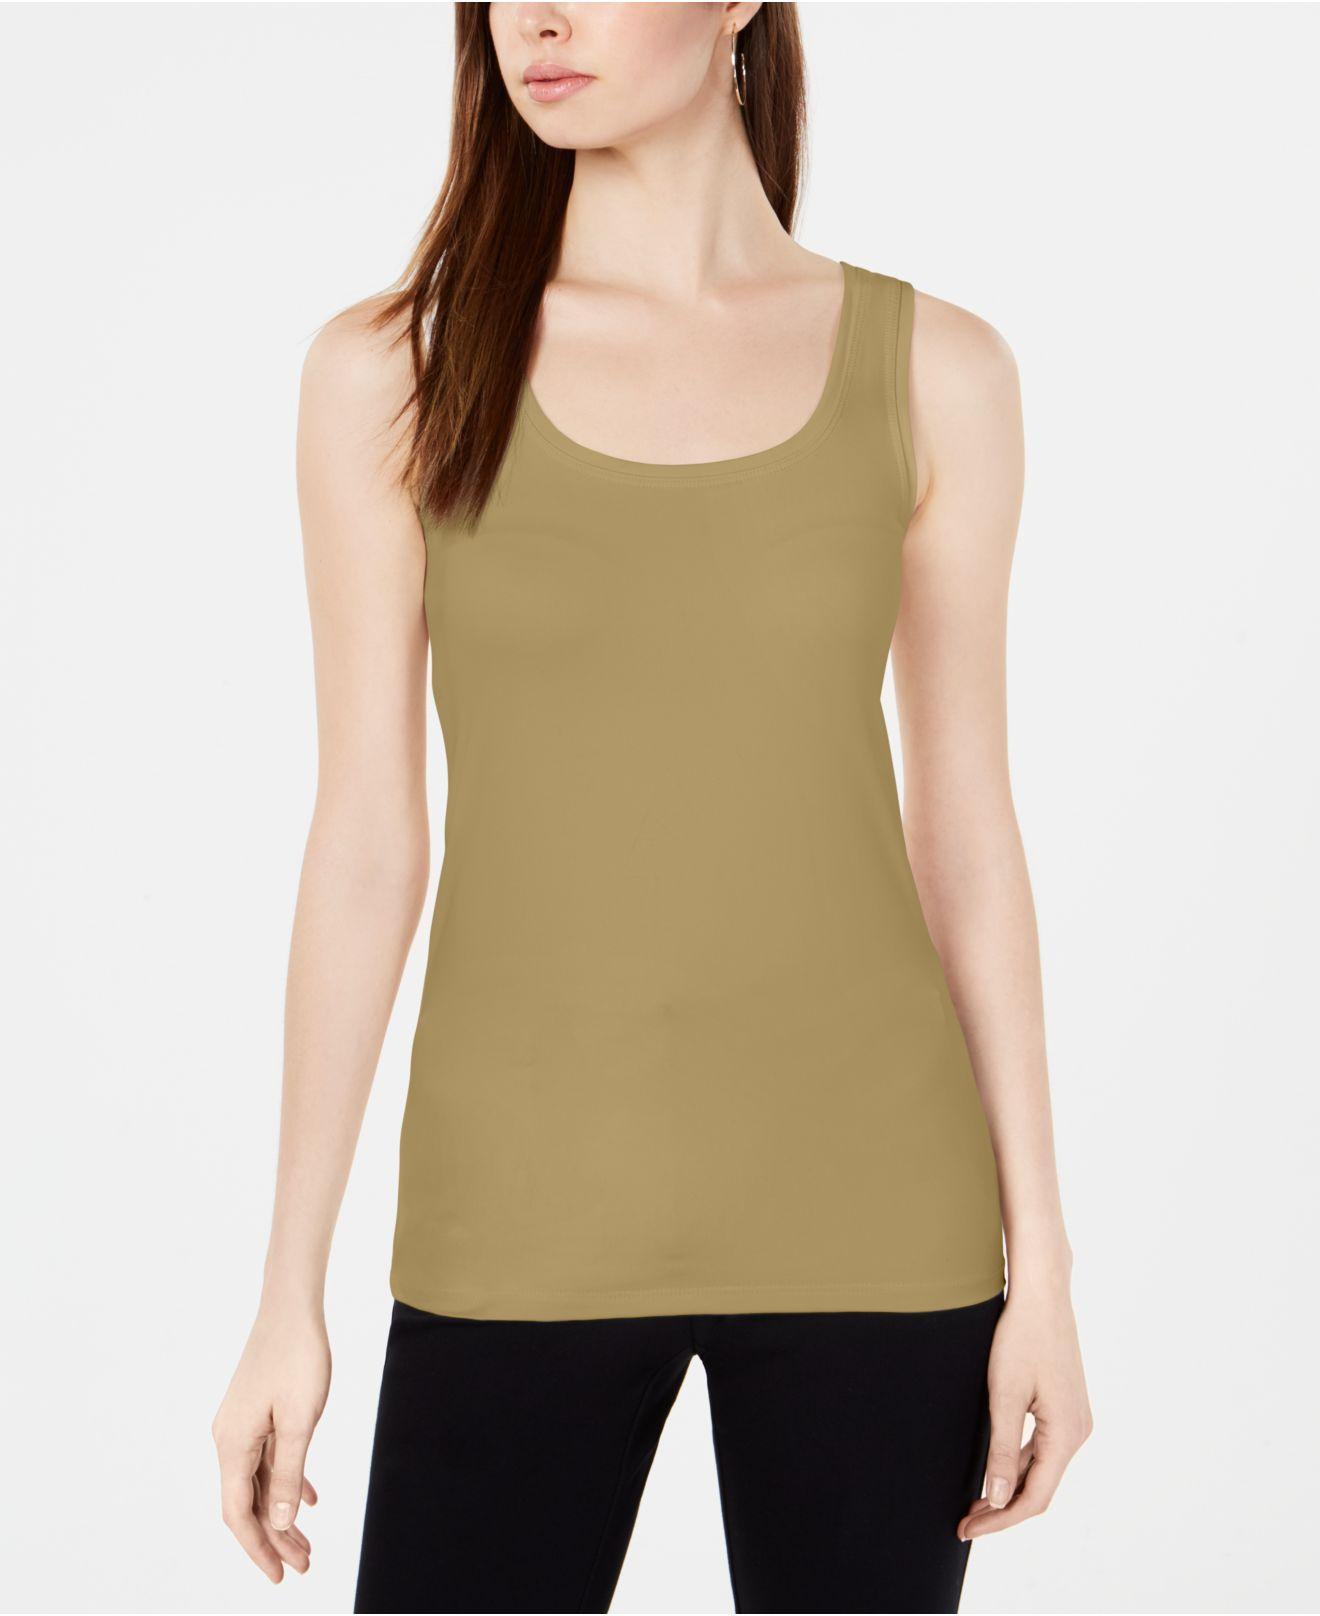 29ef67a69fe71 Alfani. Women s Green Scoop-neck Basic Tank ...